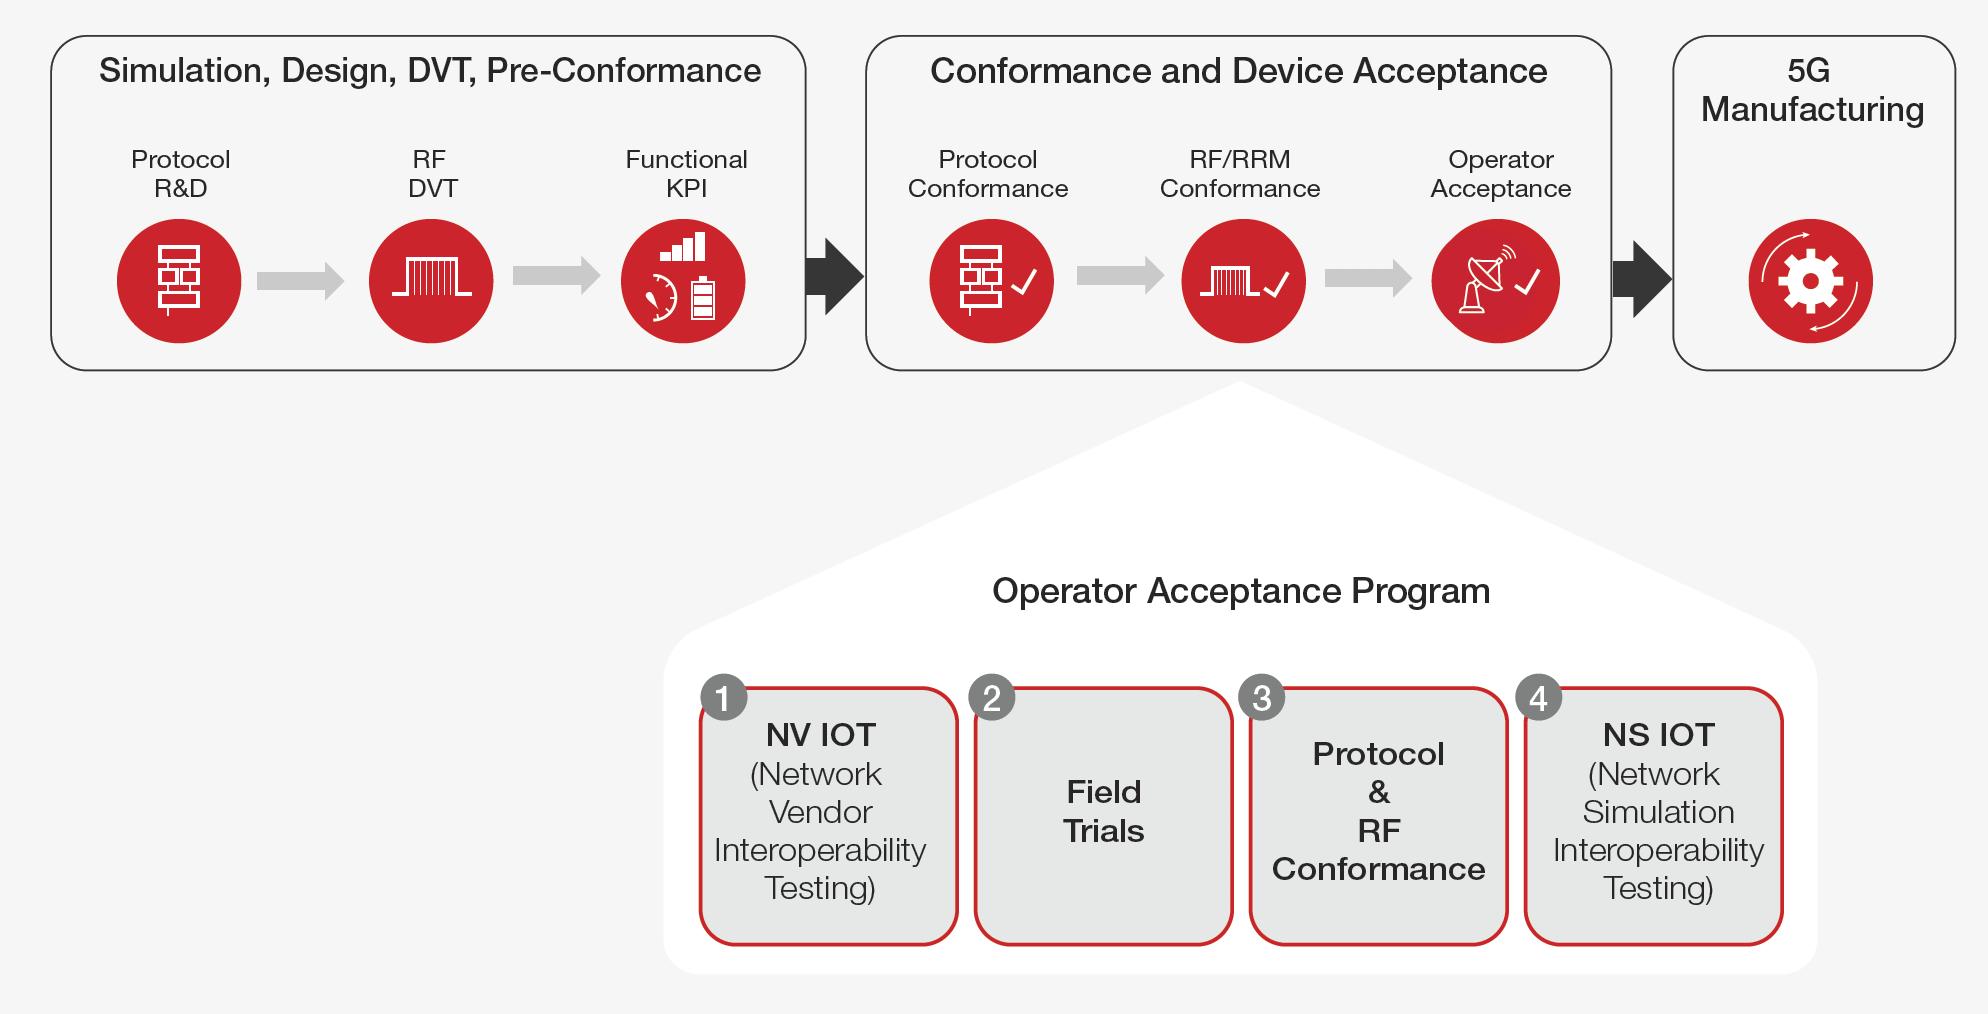 Figure 1. Device workflow includes operator acceptance test program